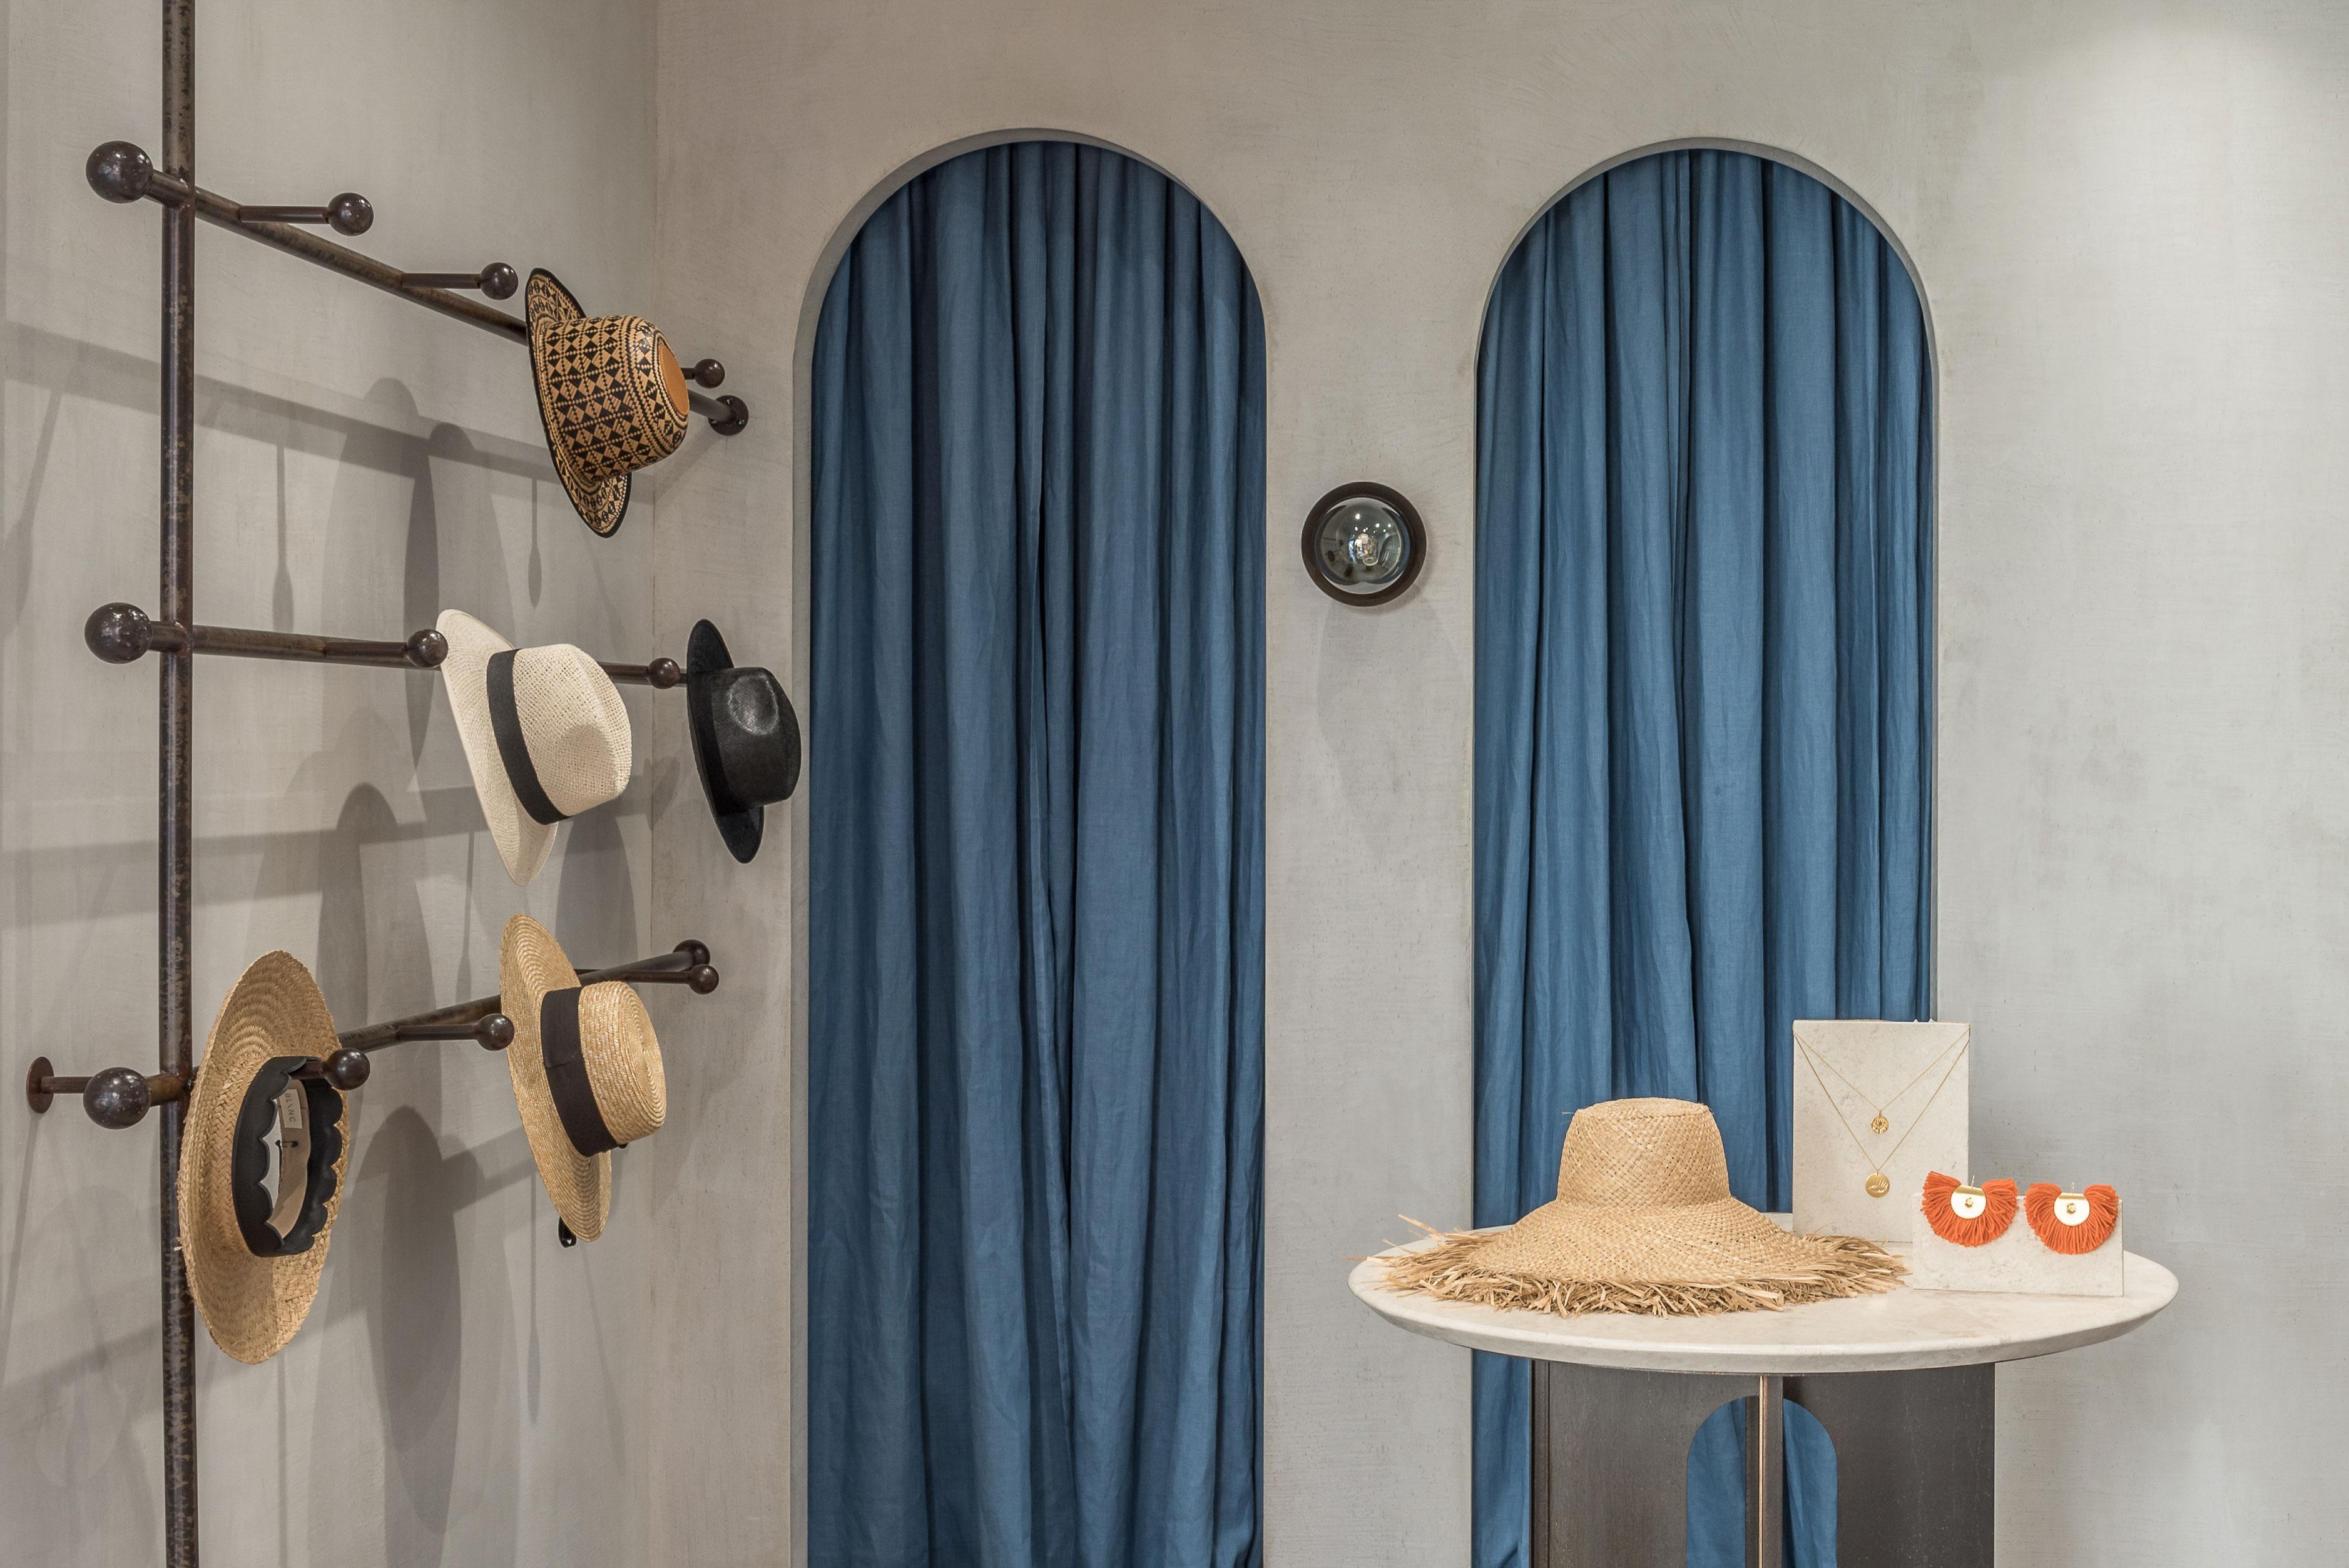 Ficurini Concept Store in Afytos, Greece by Normless Architecture Studio